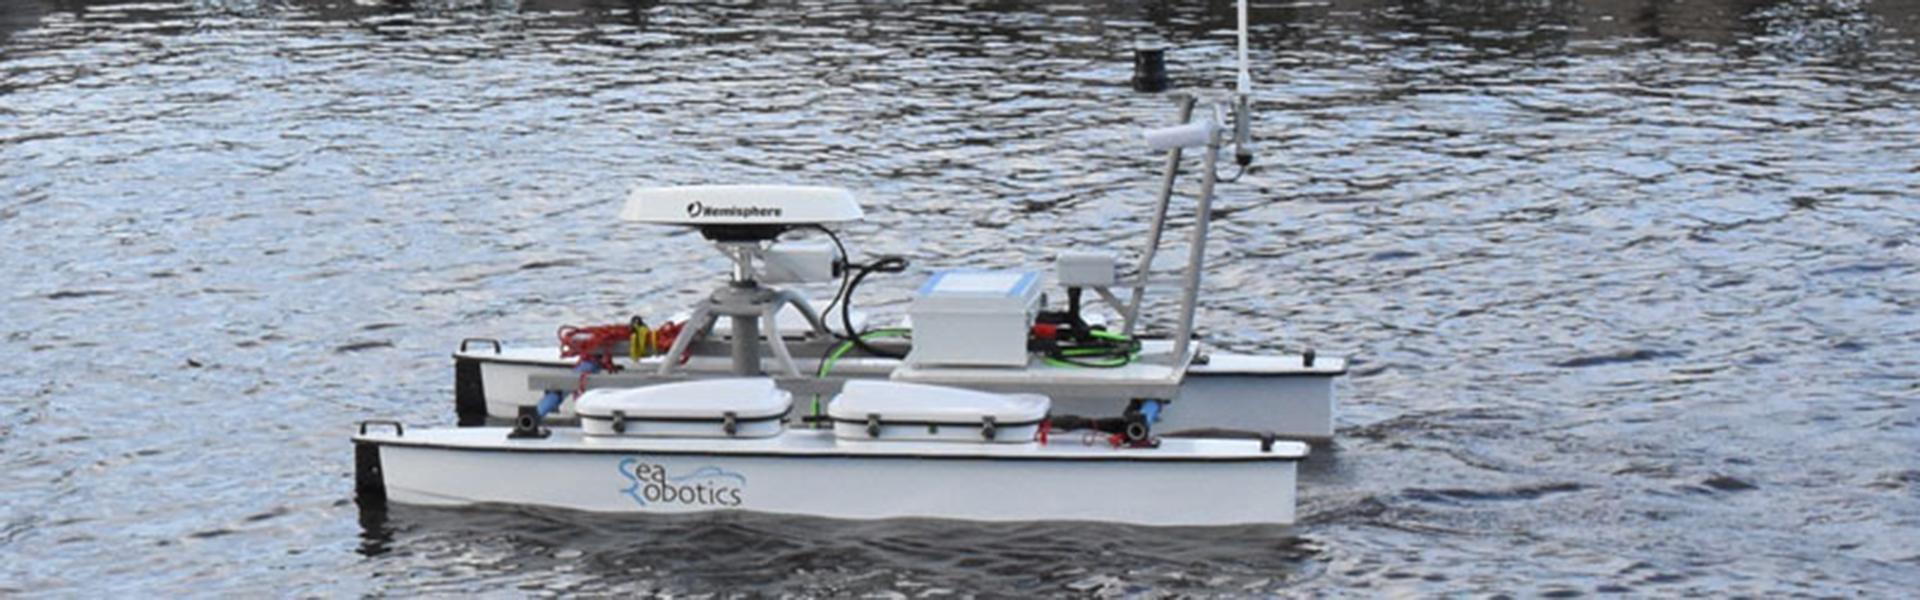 SeaRobotics Integrates SBG Systems' Ekinox-E (and Hemisphere's V320) into USV 2.5